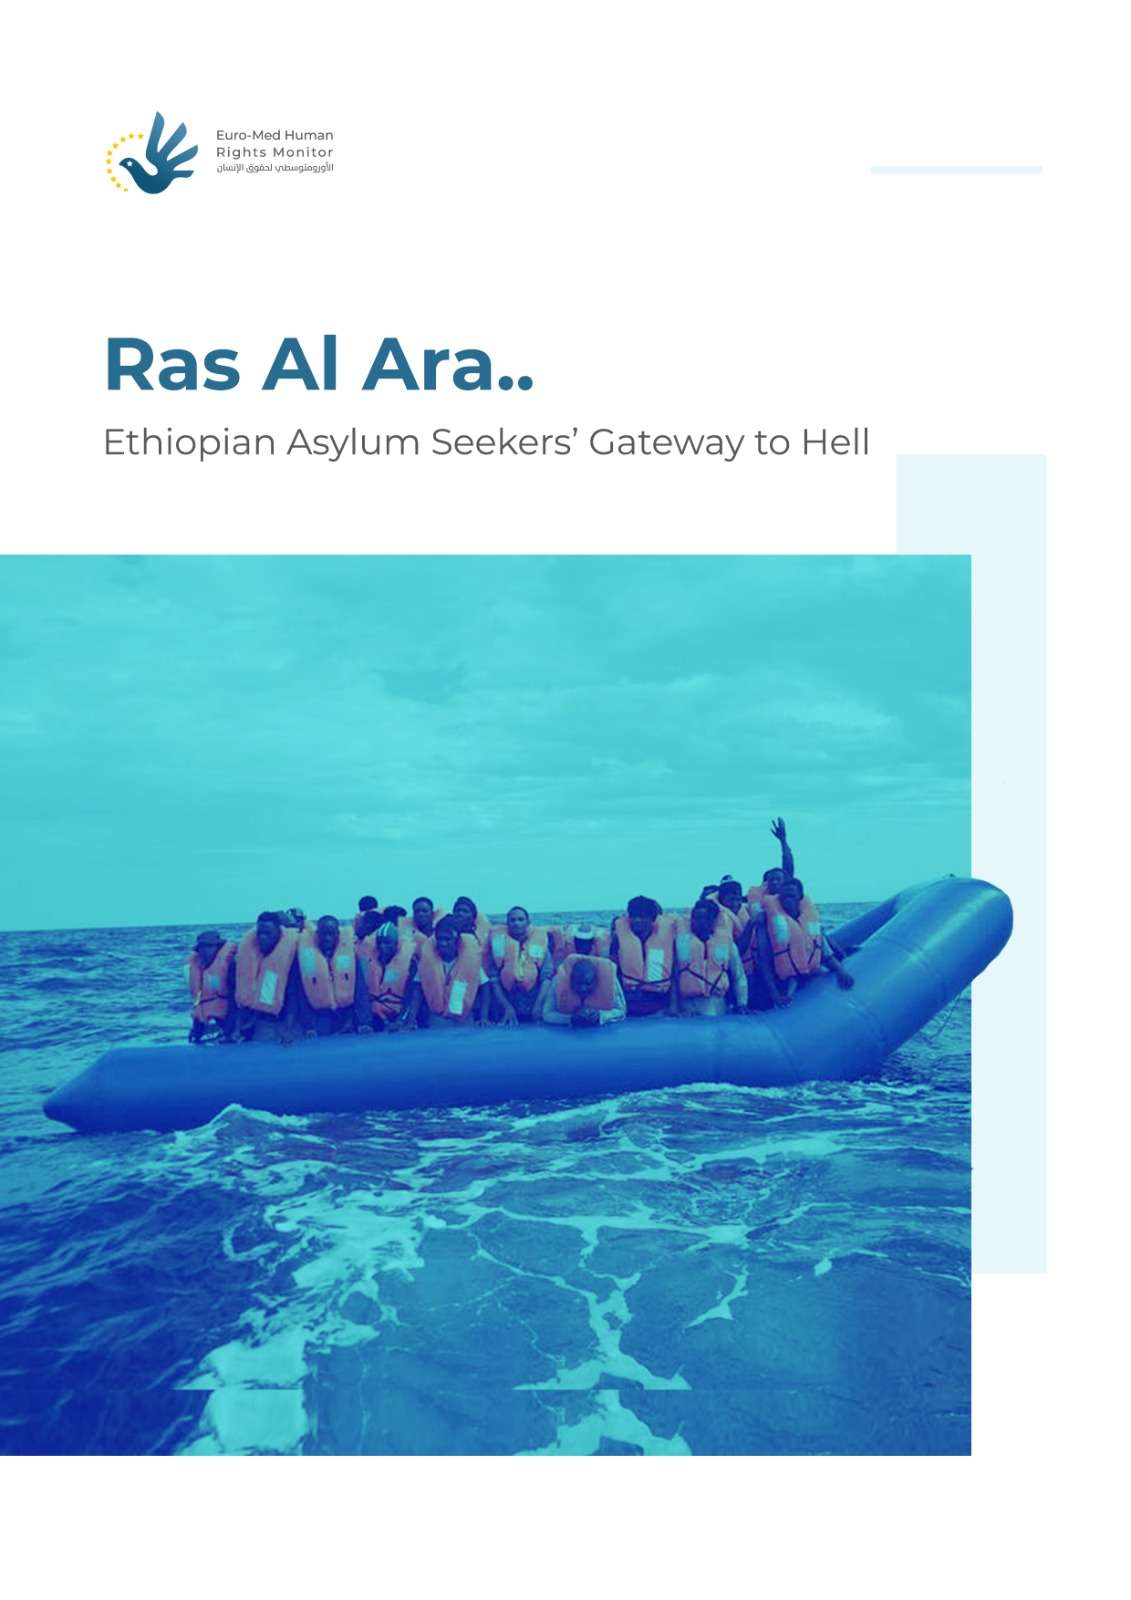 Ras Al Ara... Ethiopian Asylum Seekers' Gateway to Hell